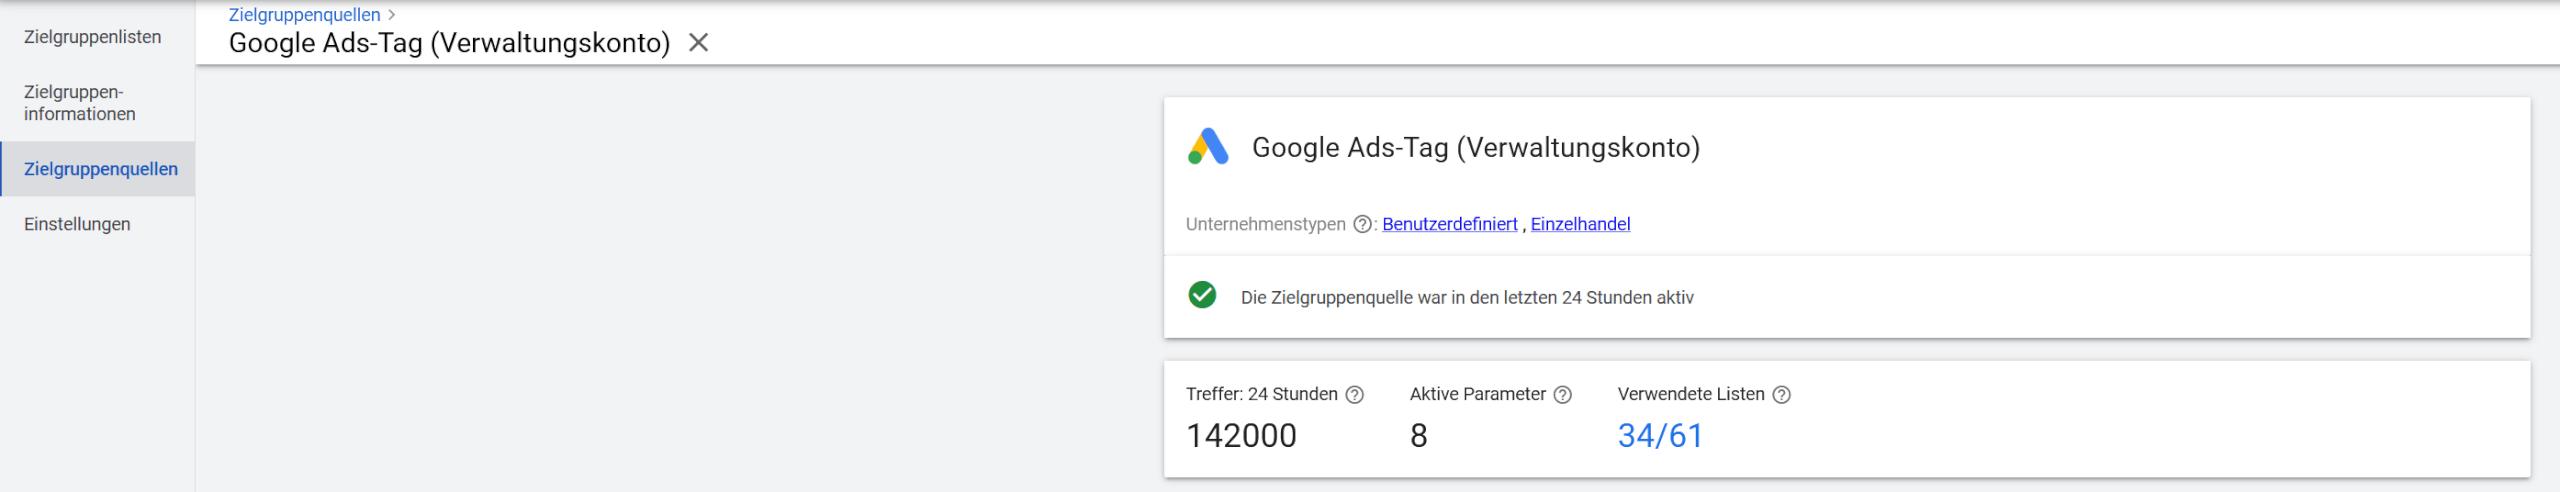 Google Ads Tag dynamisches Remarketing